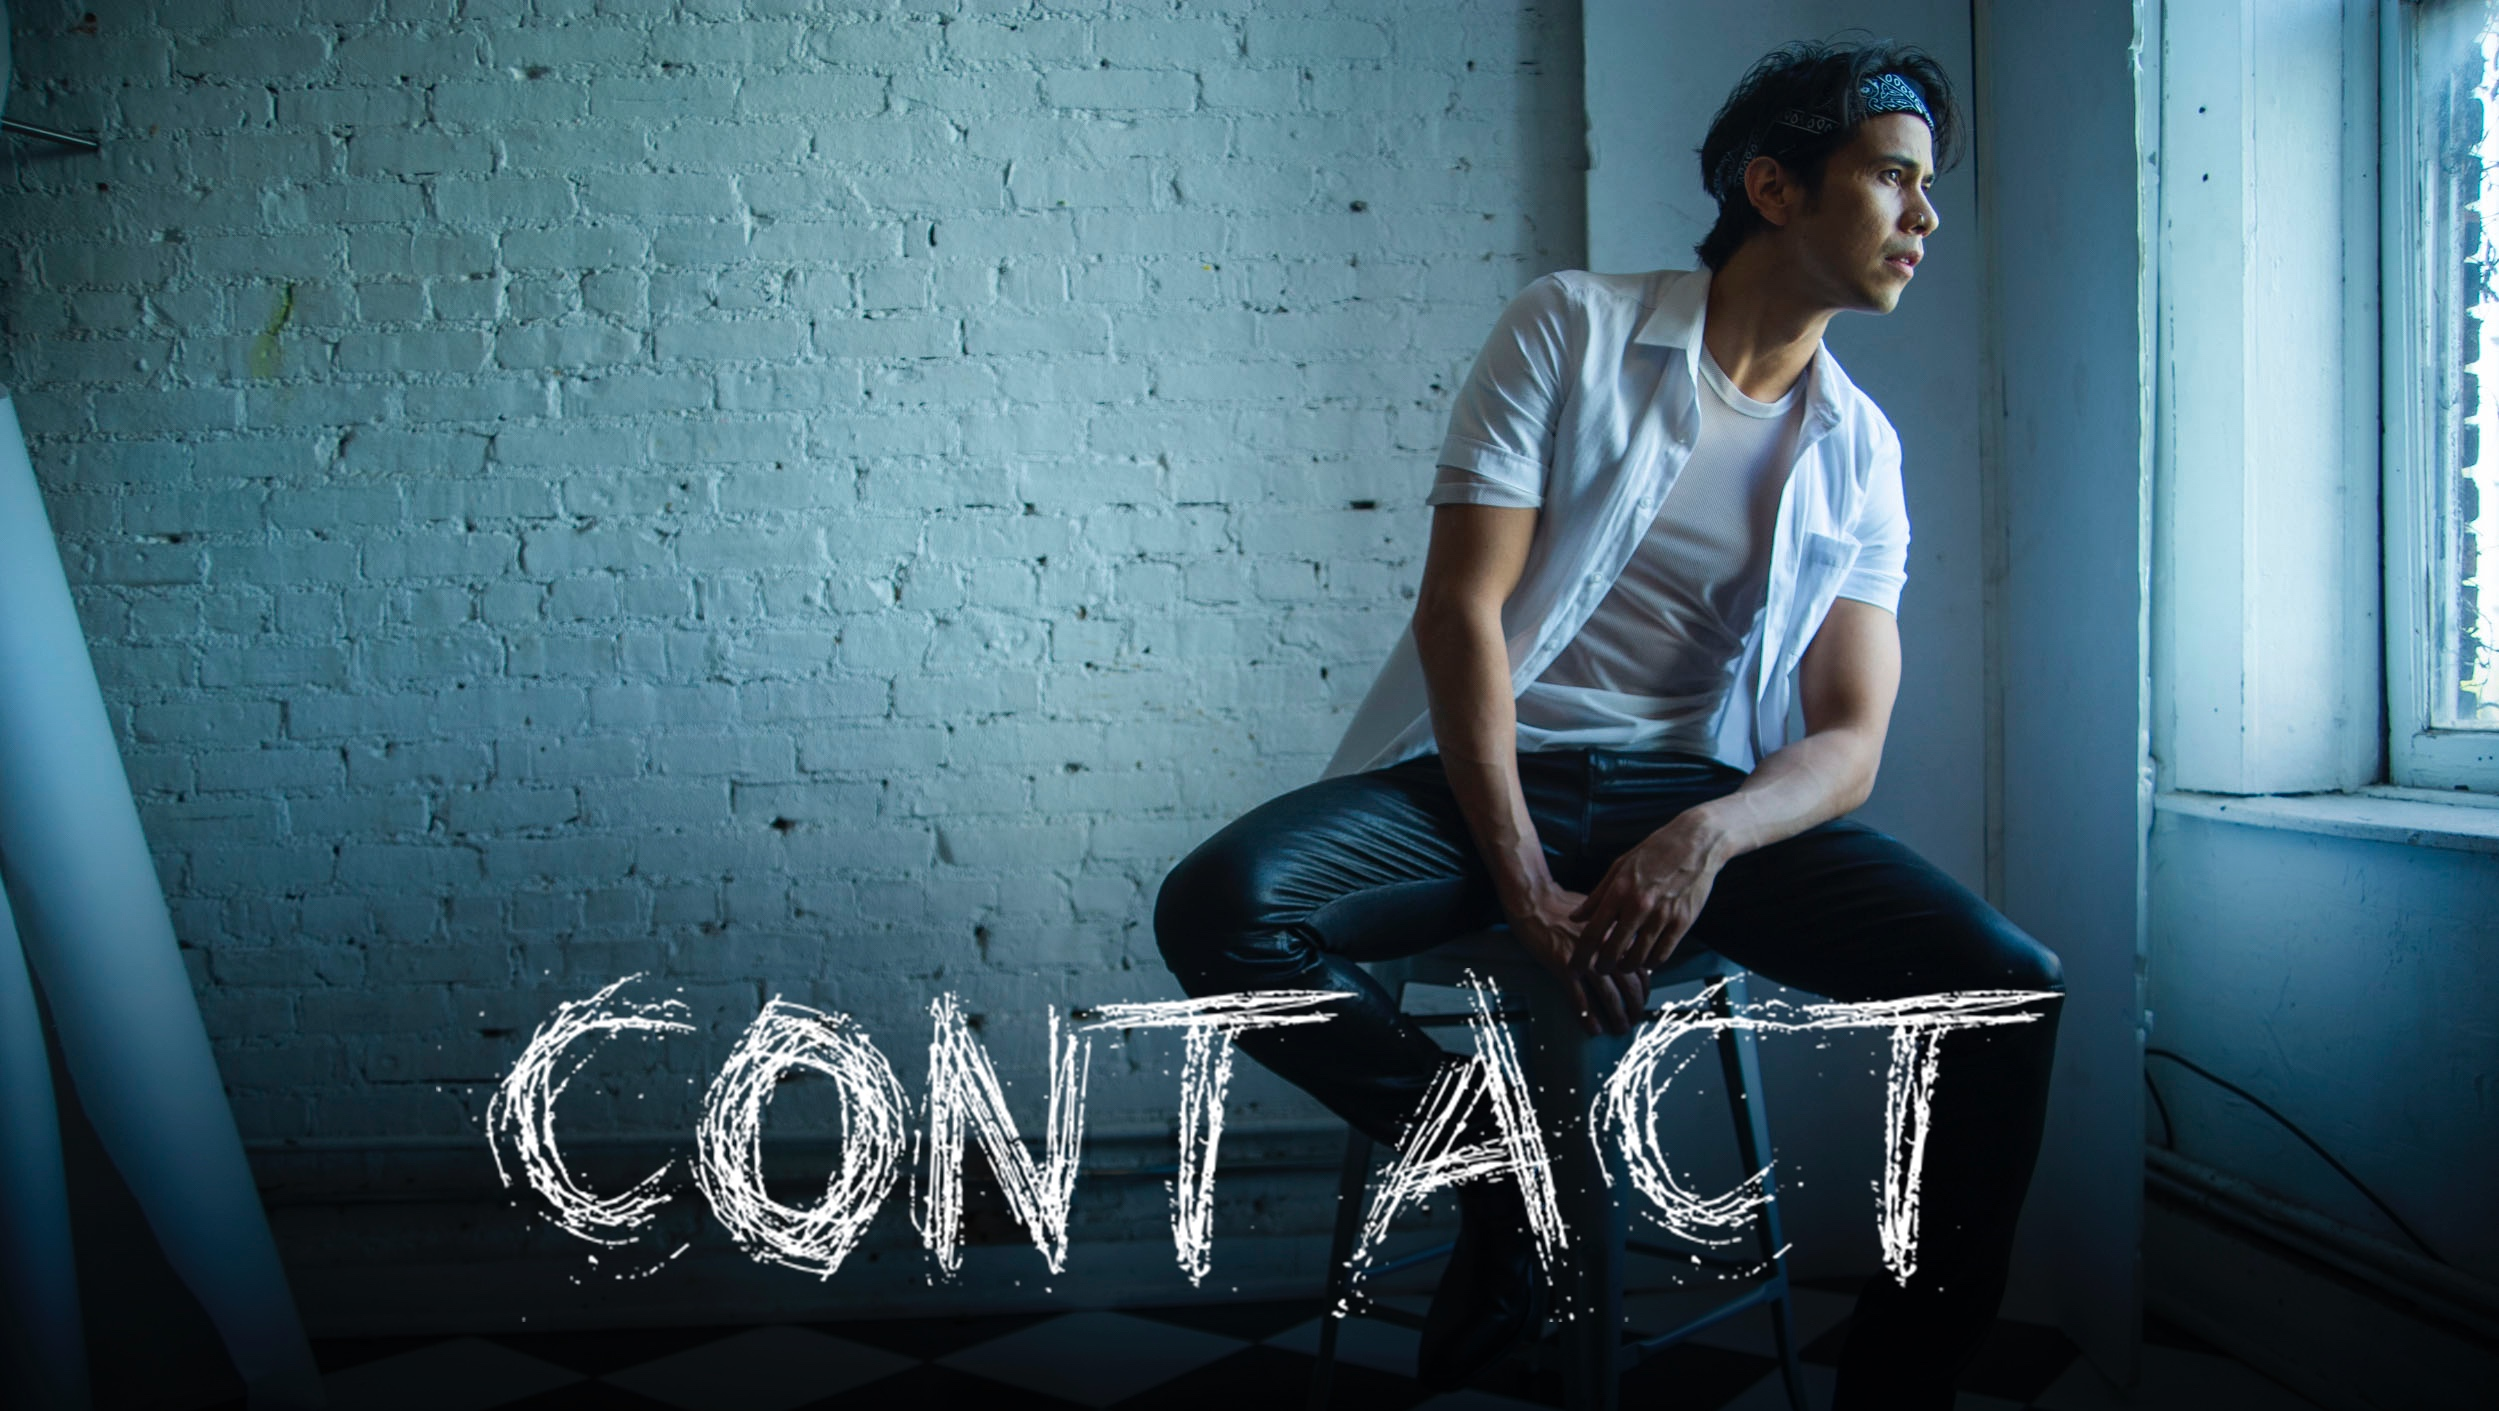 CONTACT_02.jpg